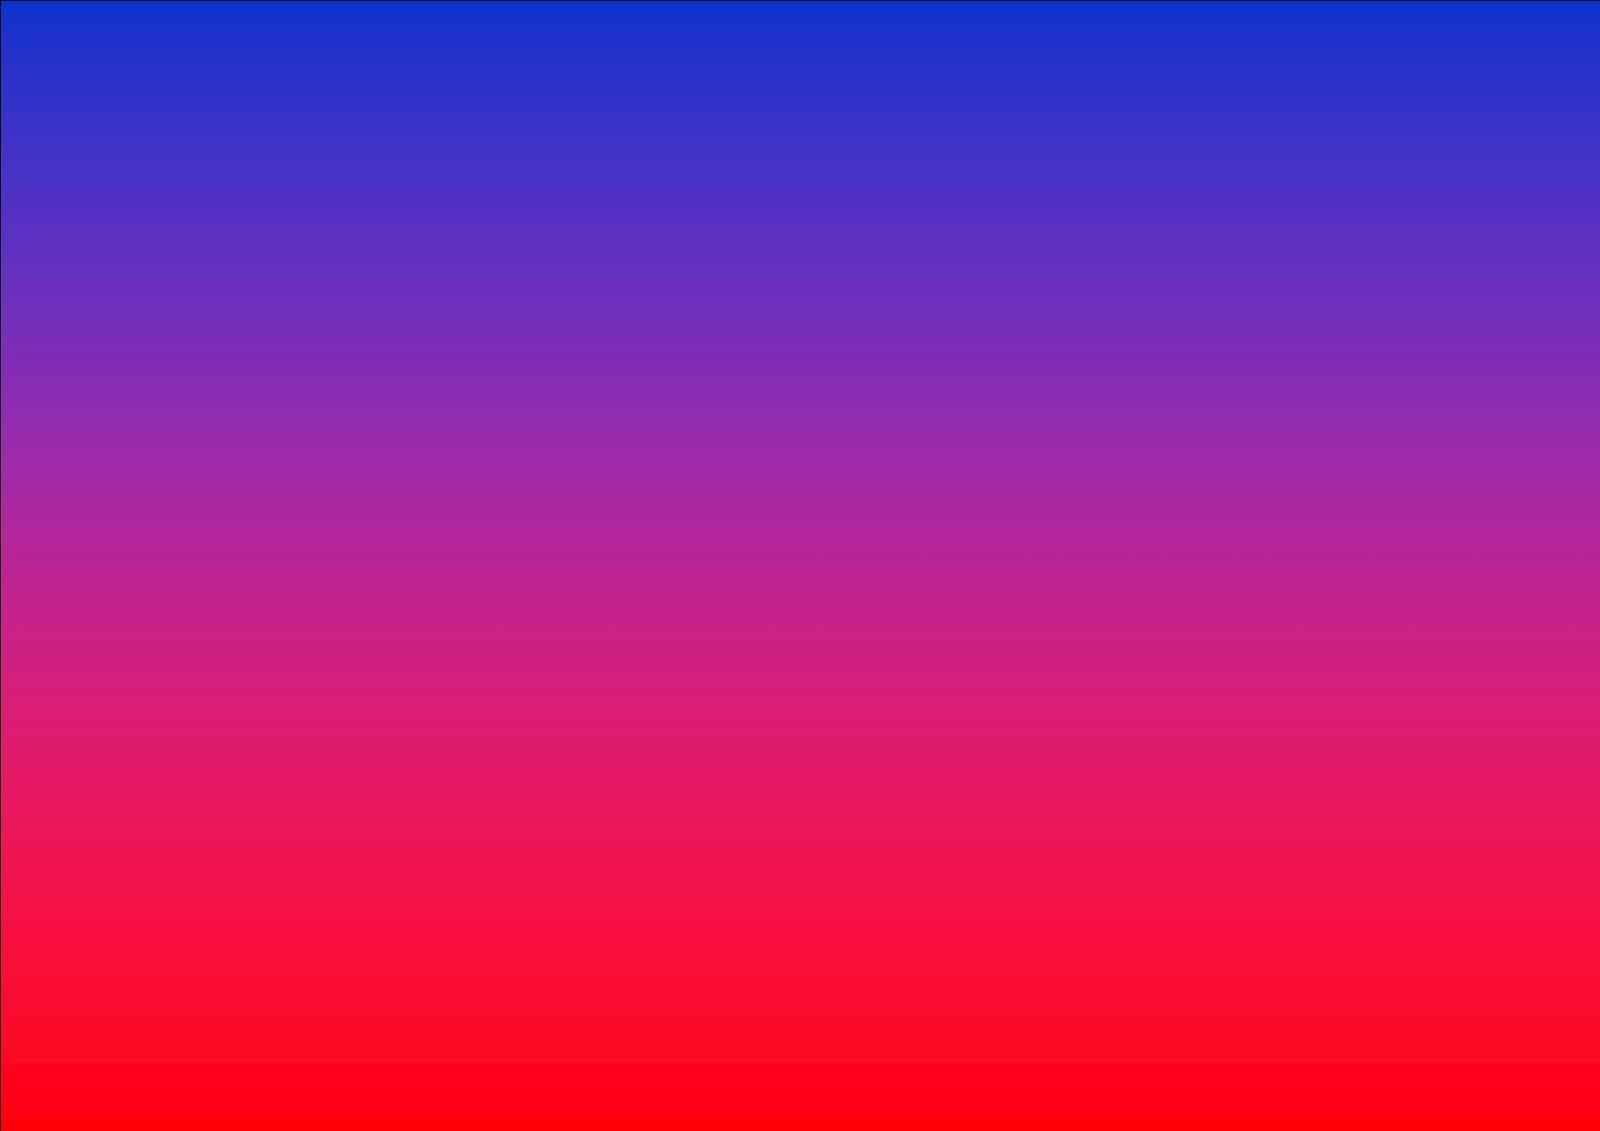 Iphone X Wallpaper Gif Landscape Zoom Dise 209 O Y Fotografia Fondos Degradee De Colores Pasteles